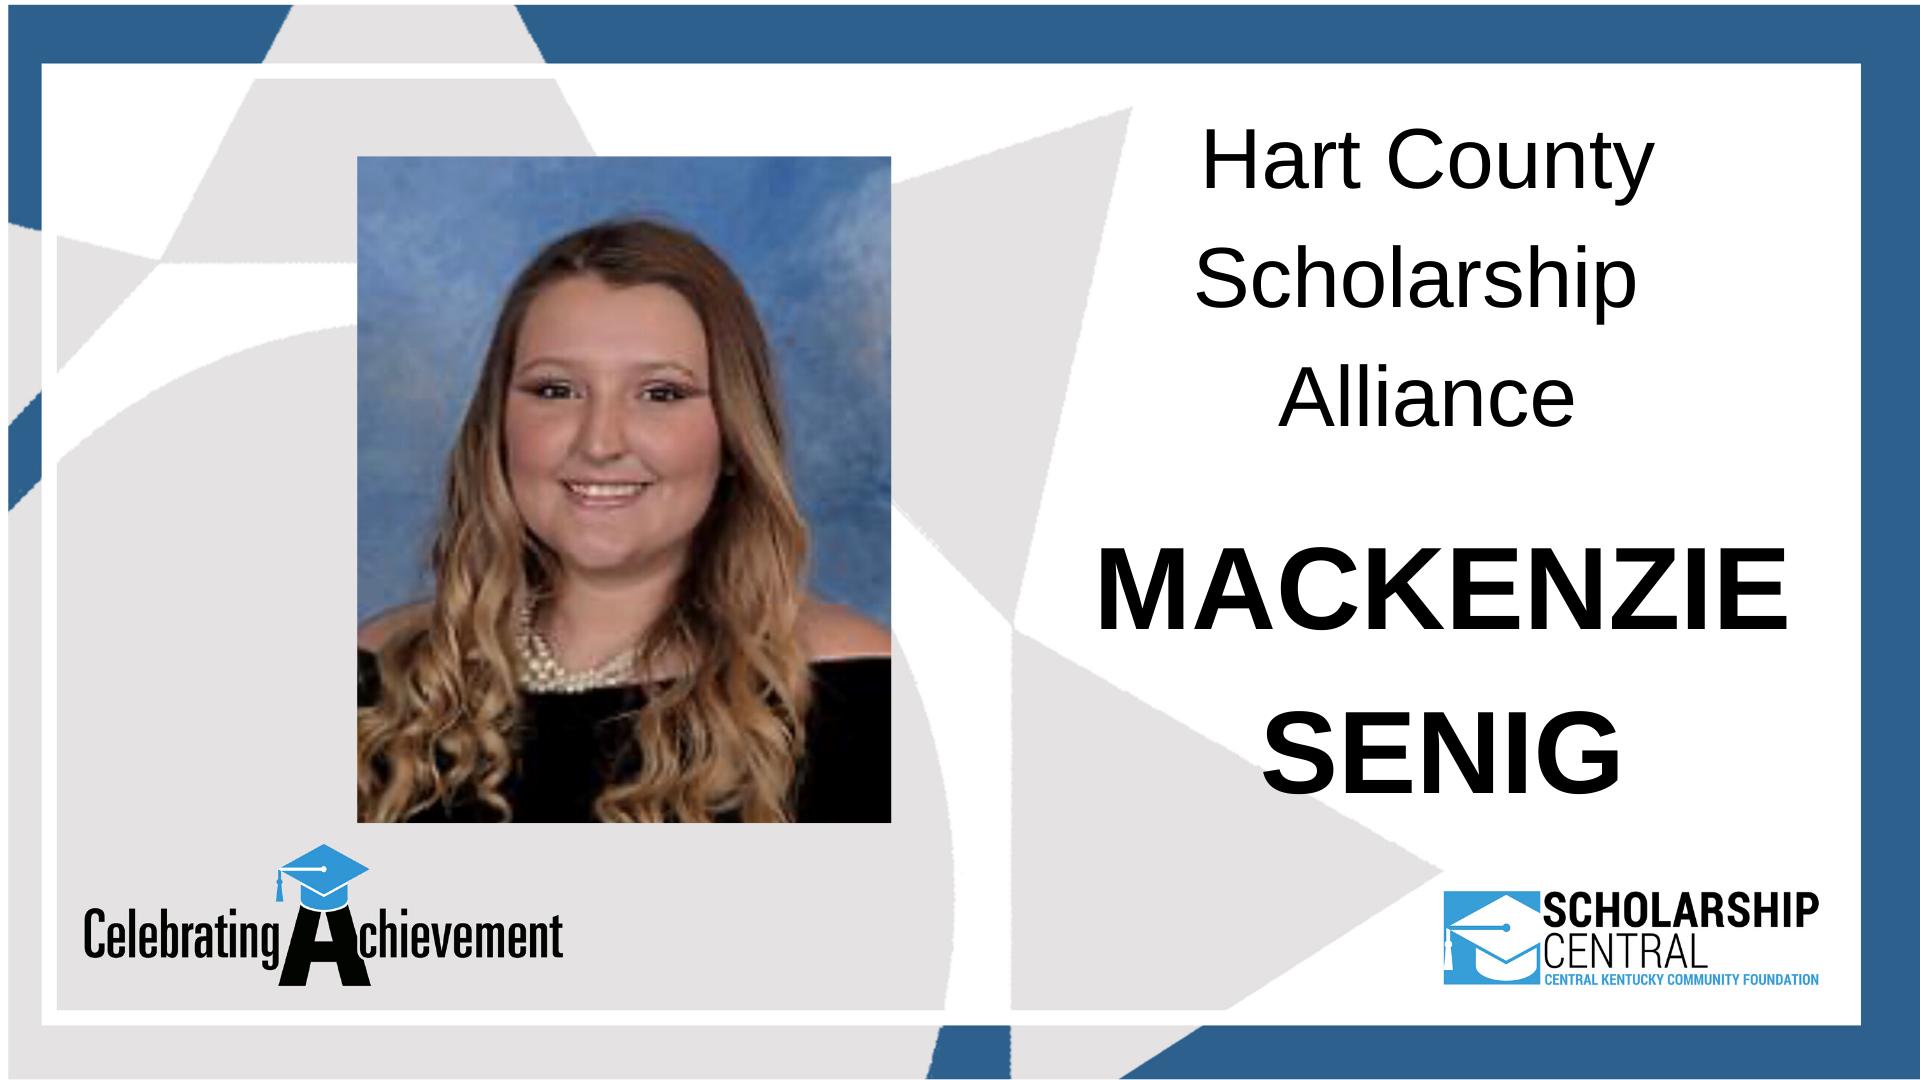 Hart County Scholarship Alliance